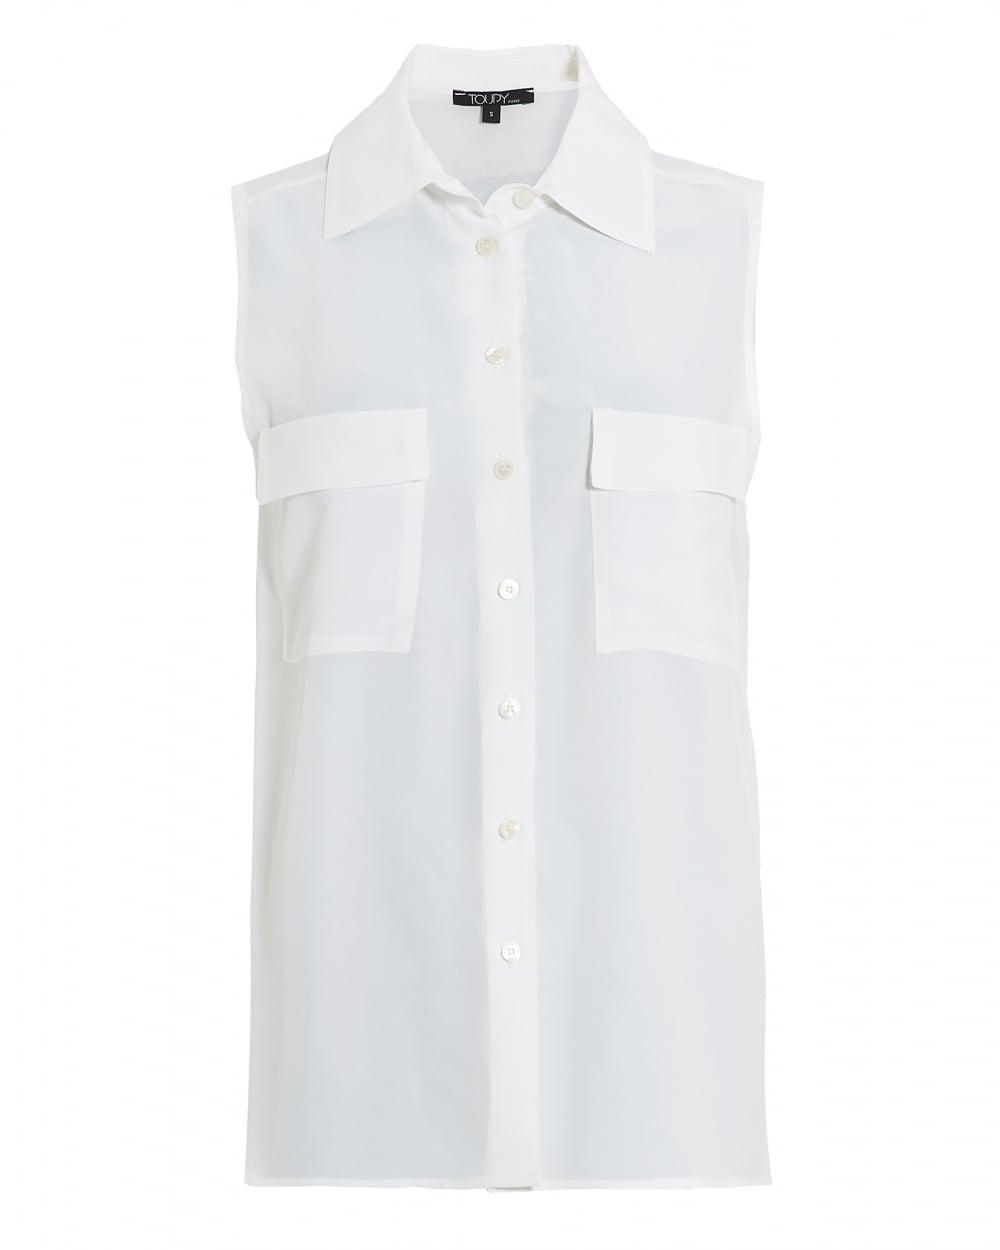 Toupy Womens Fisher Blouse Sleeveless White Shirt